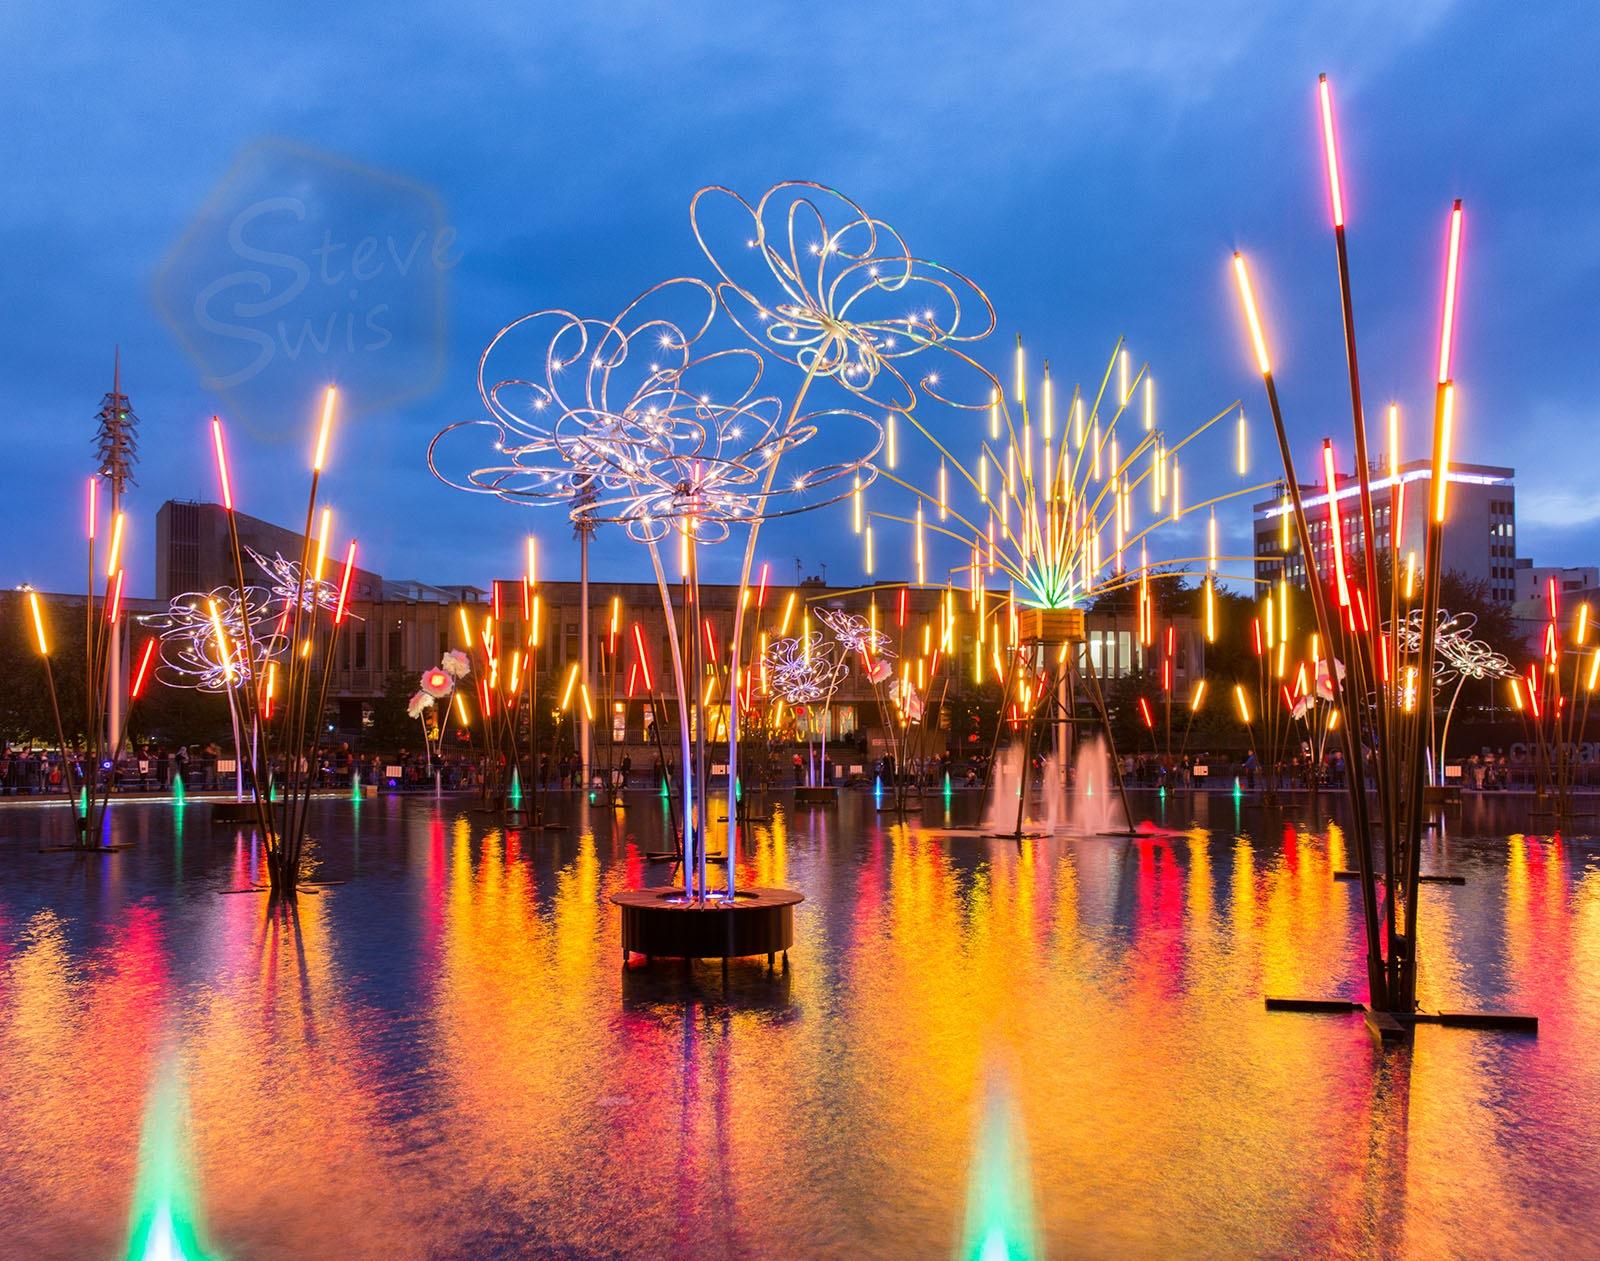 Forest of Light by Steve Swis